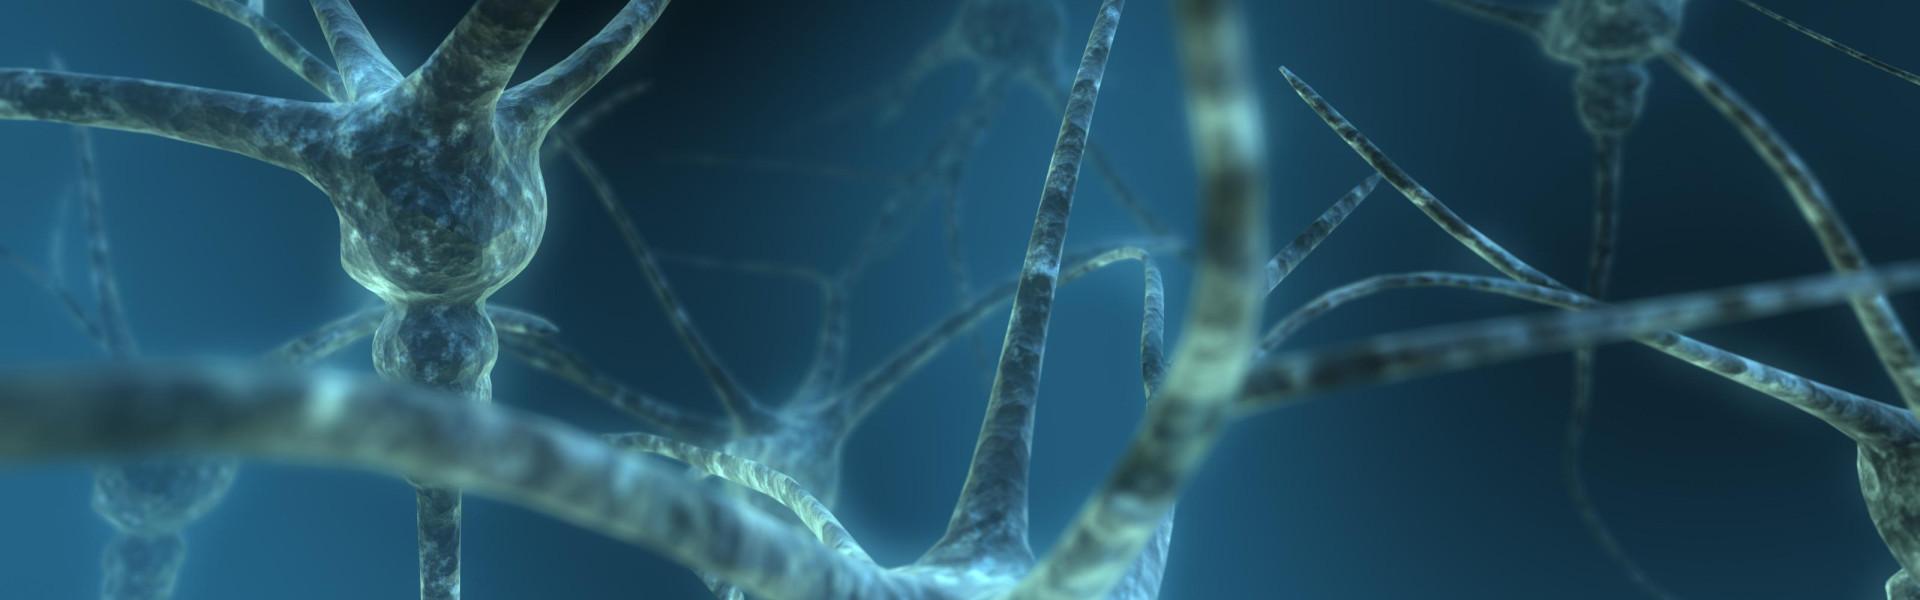 Neuron-1-Cropped-e1382492339555